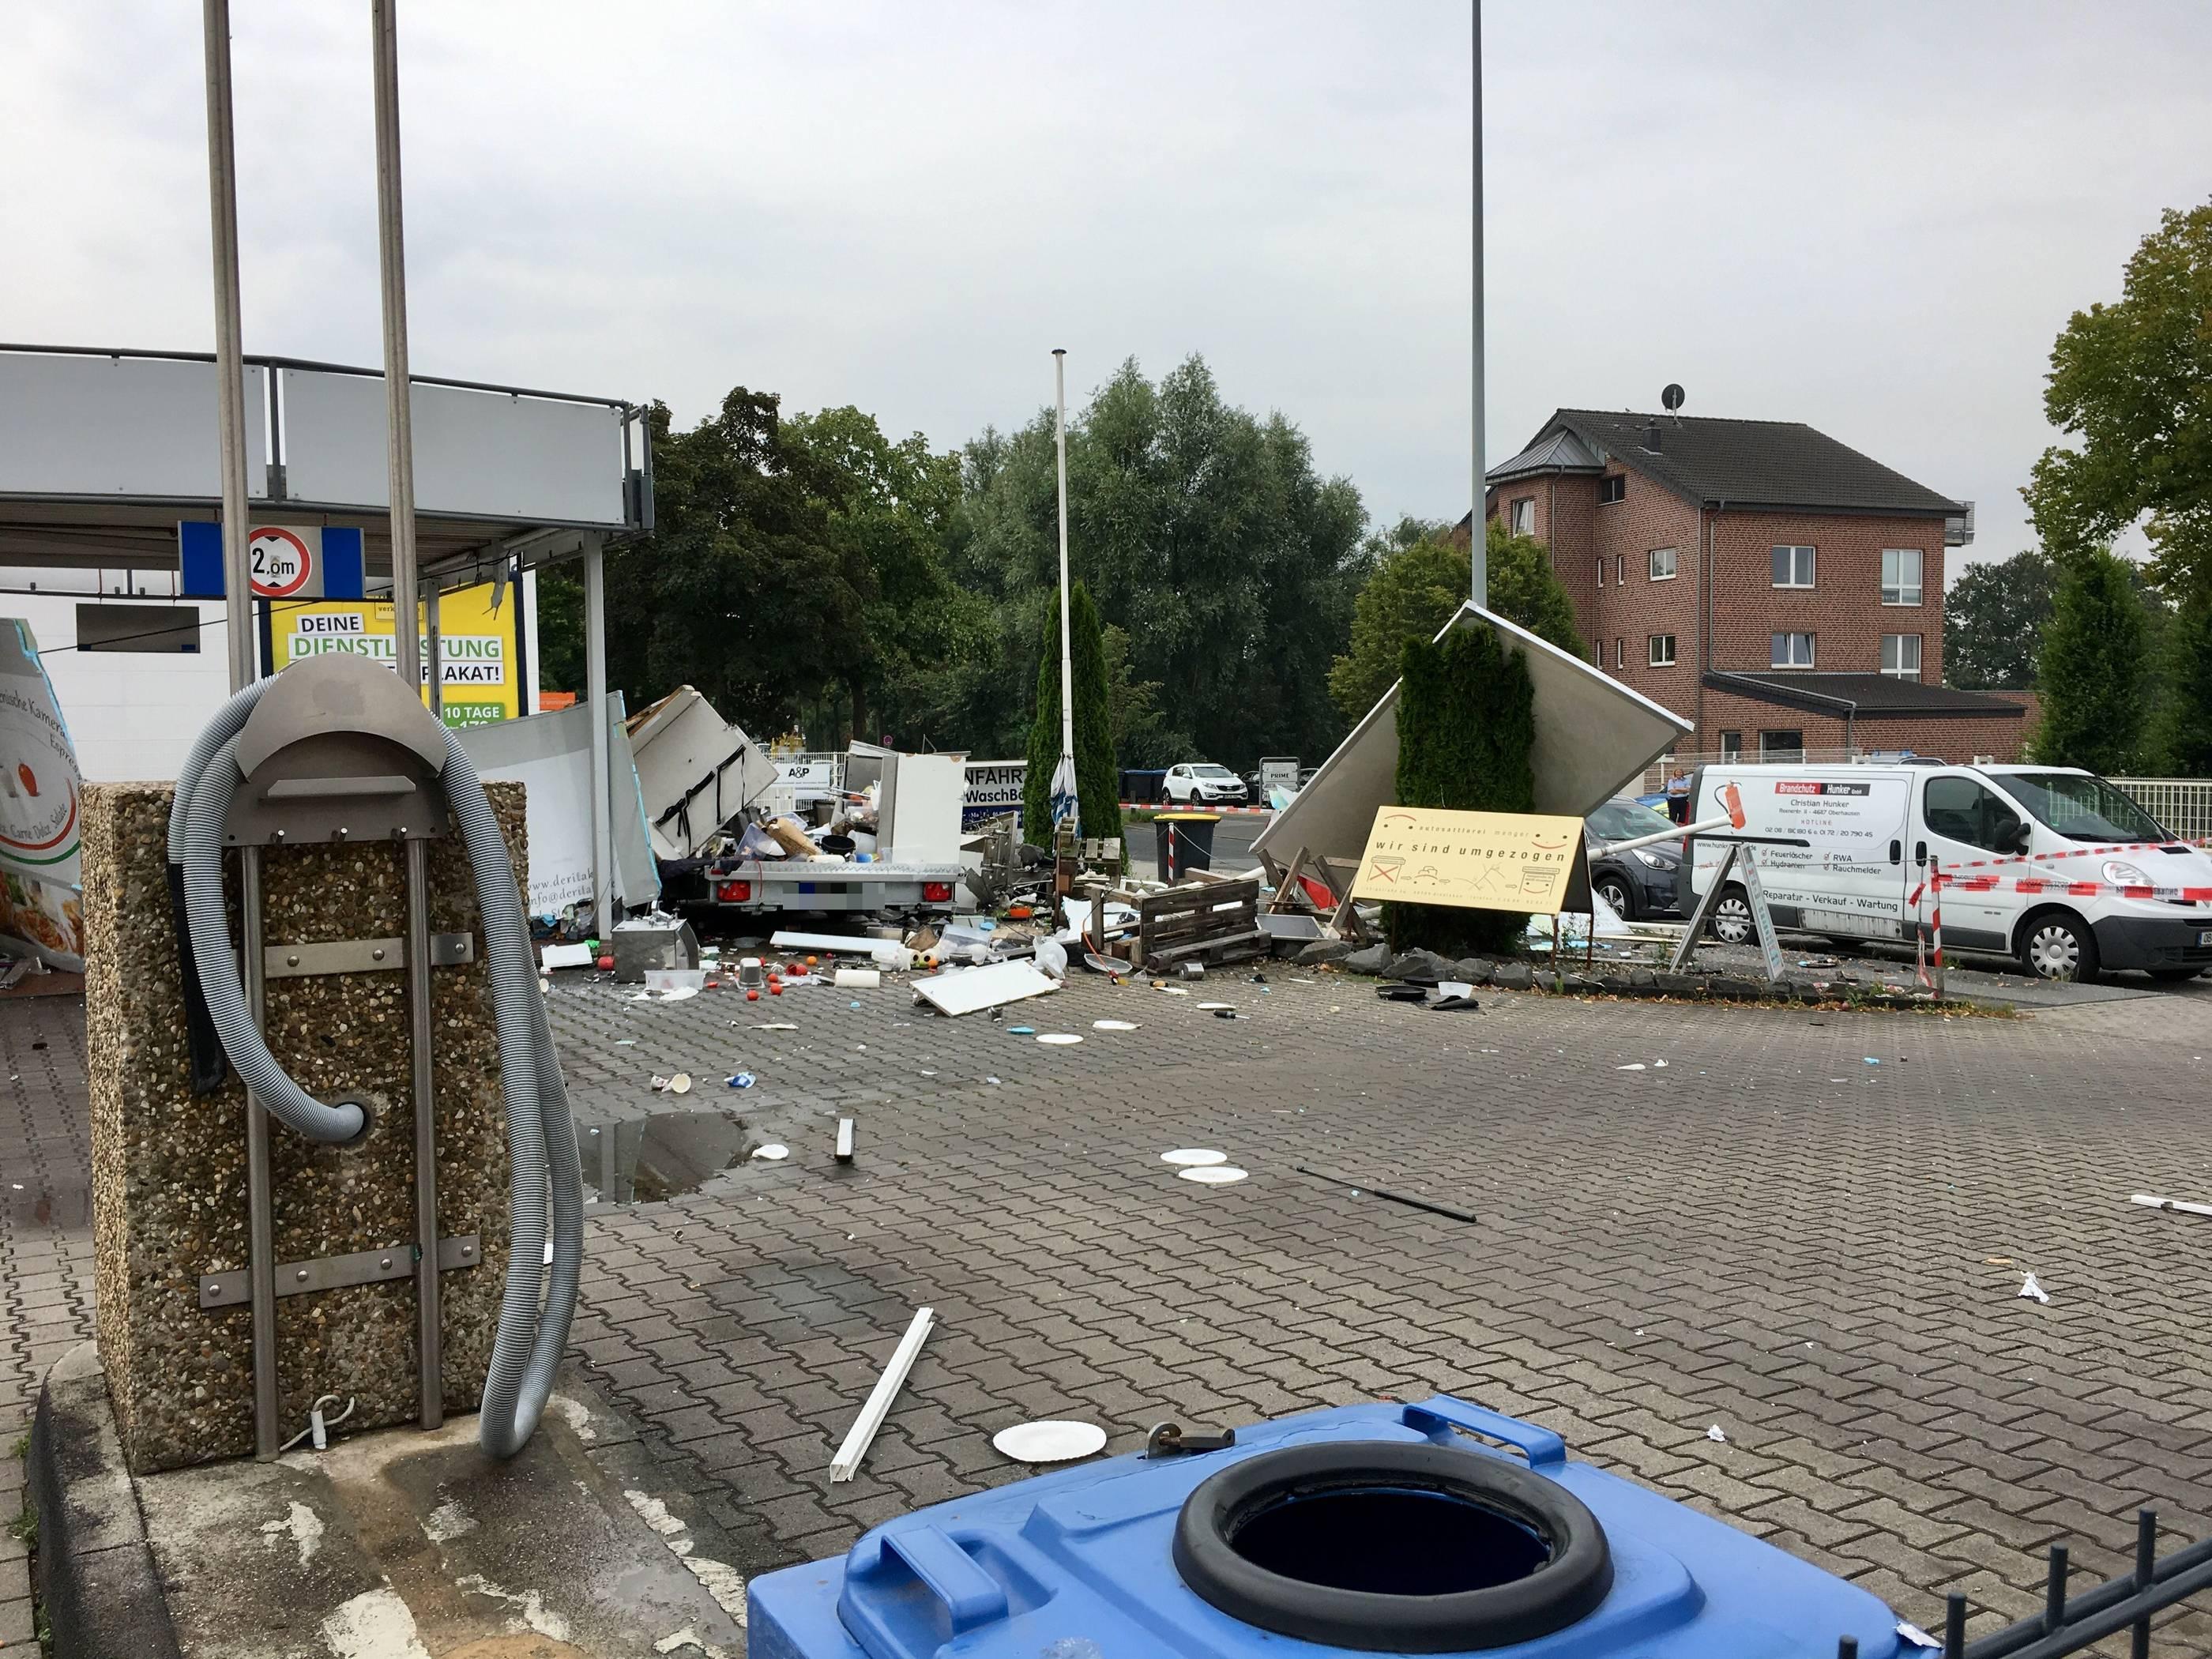 Dinslaken Foodtruck Explodiert Trummerteile Beschadigen Autos